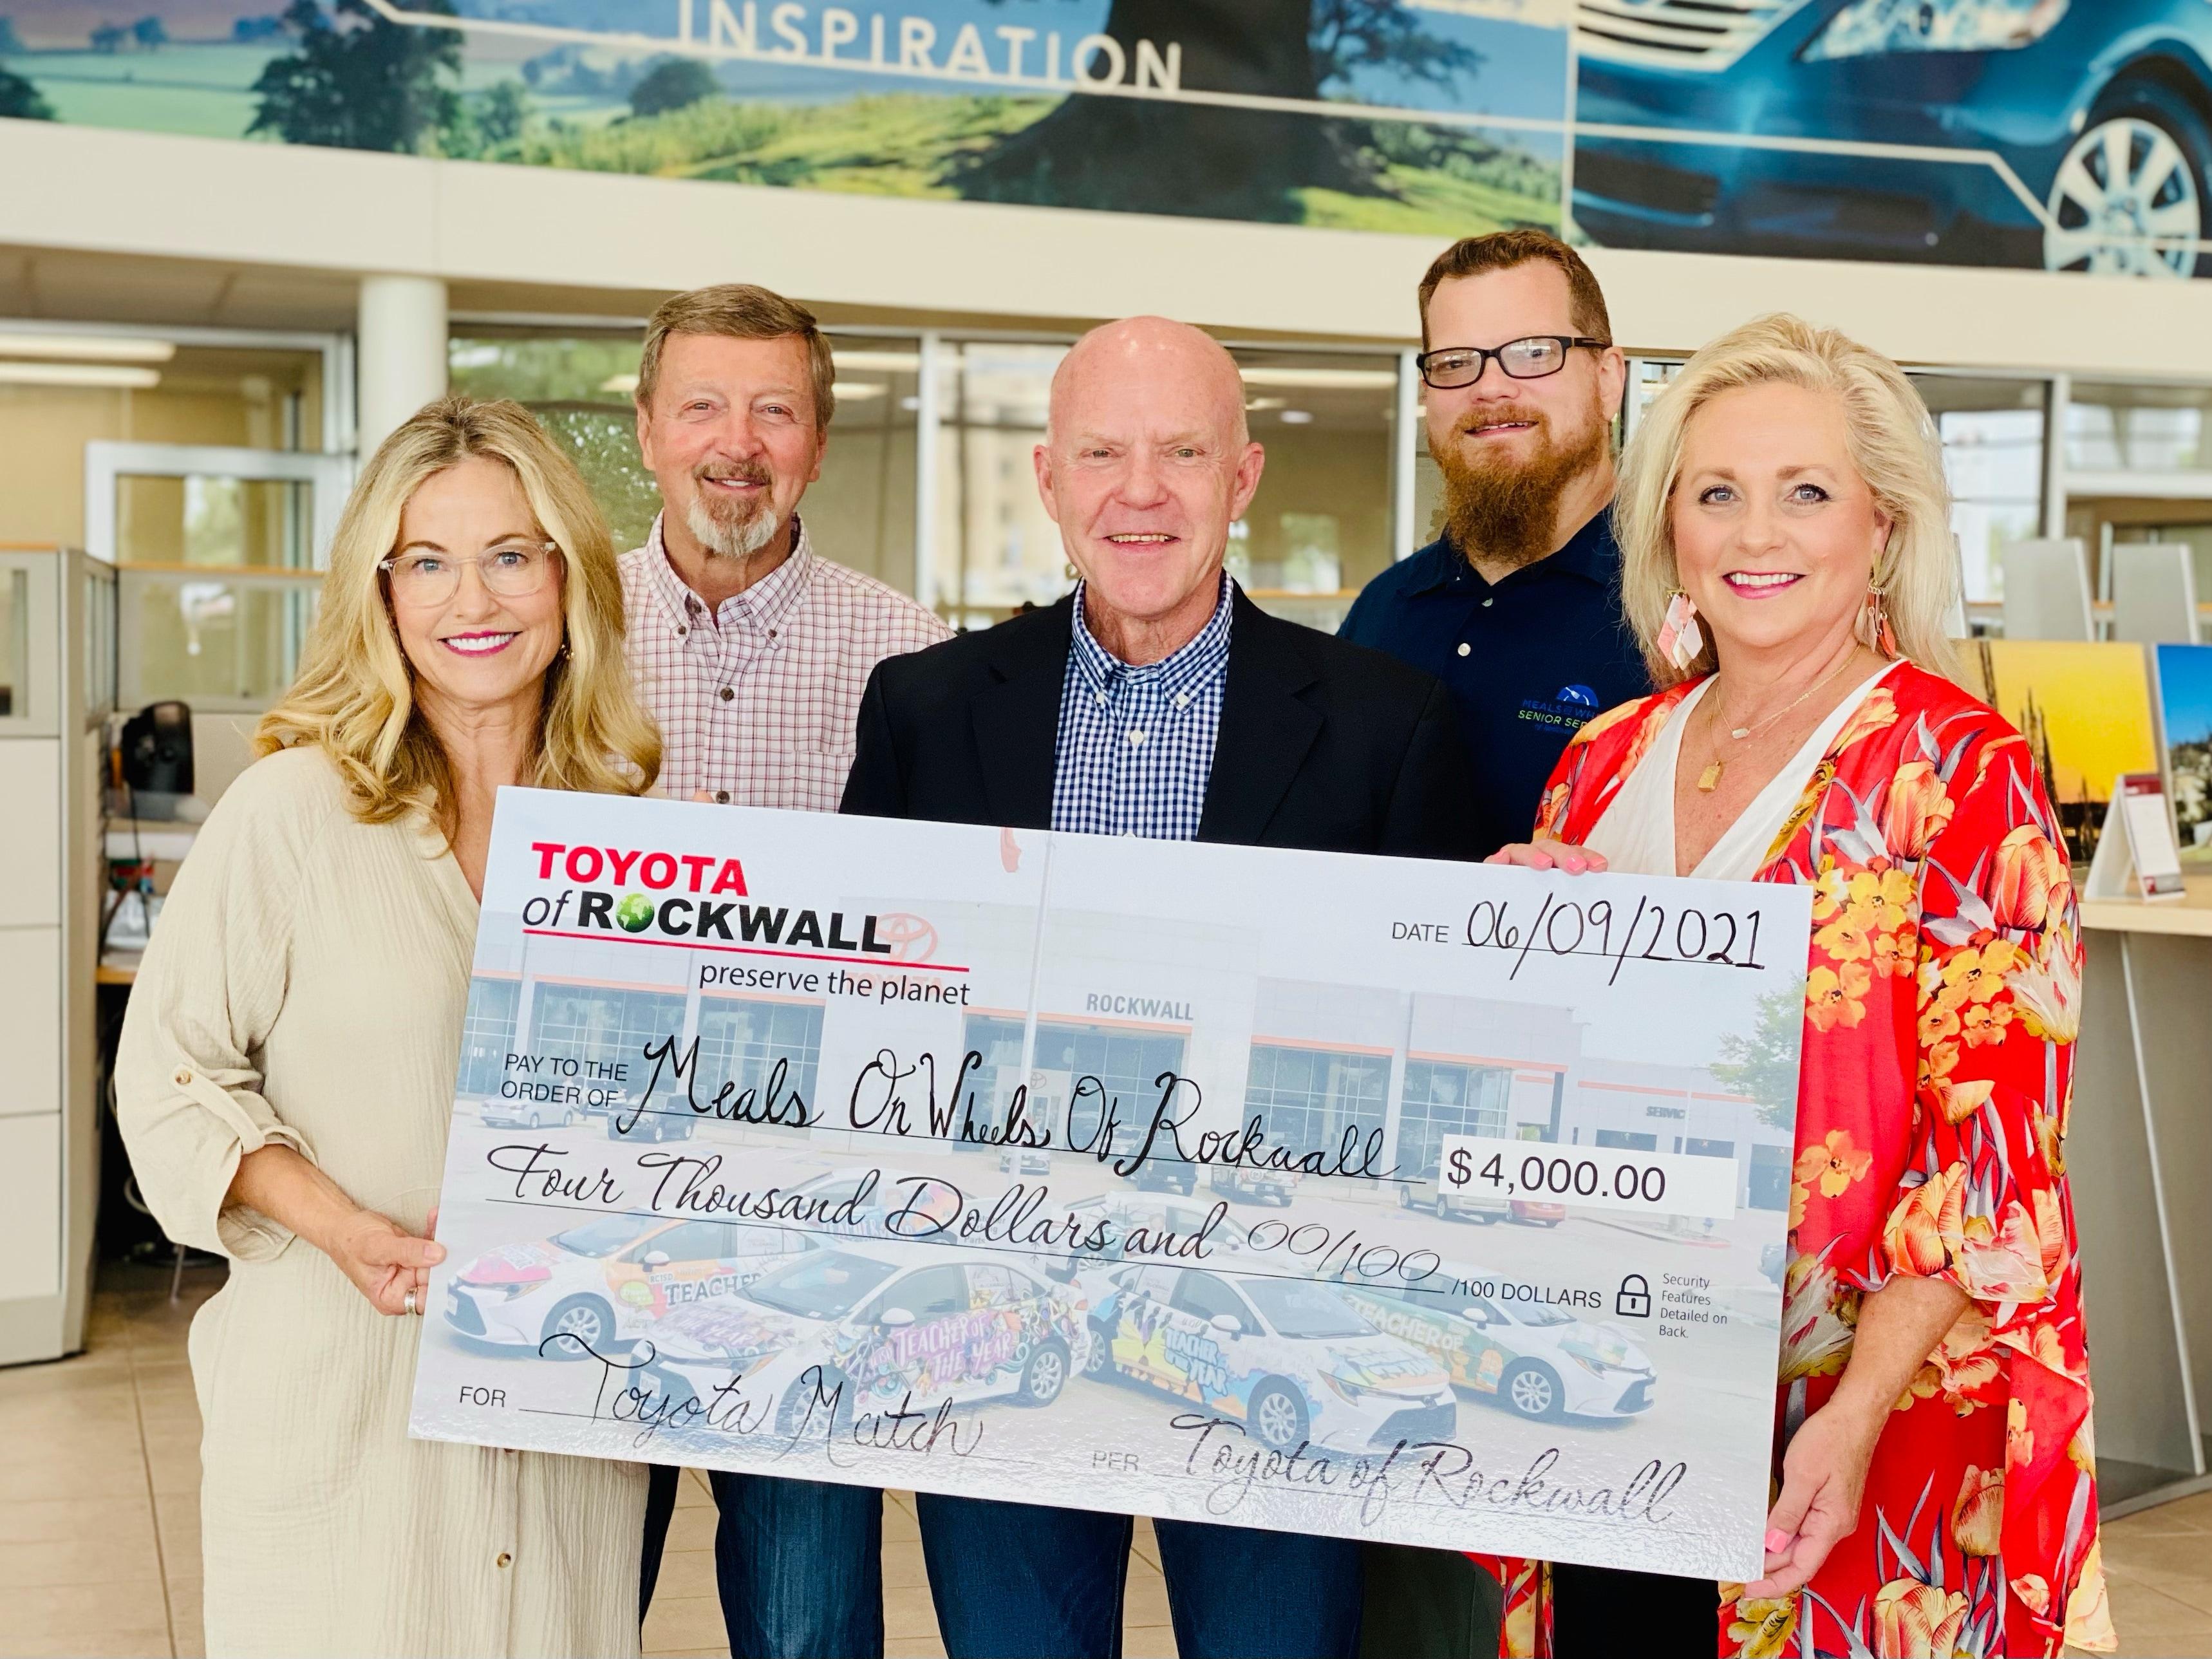 Toyota of Rockwall Grants